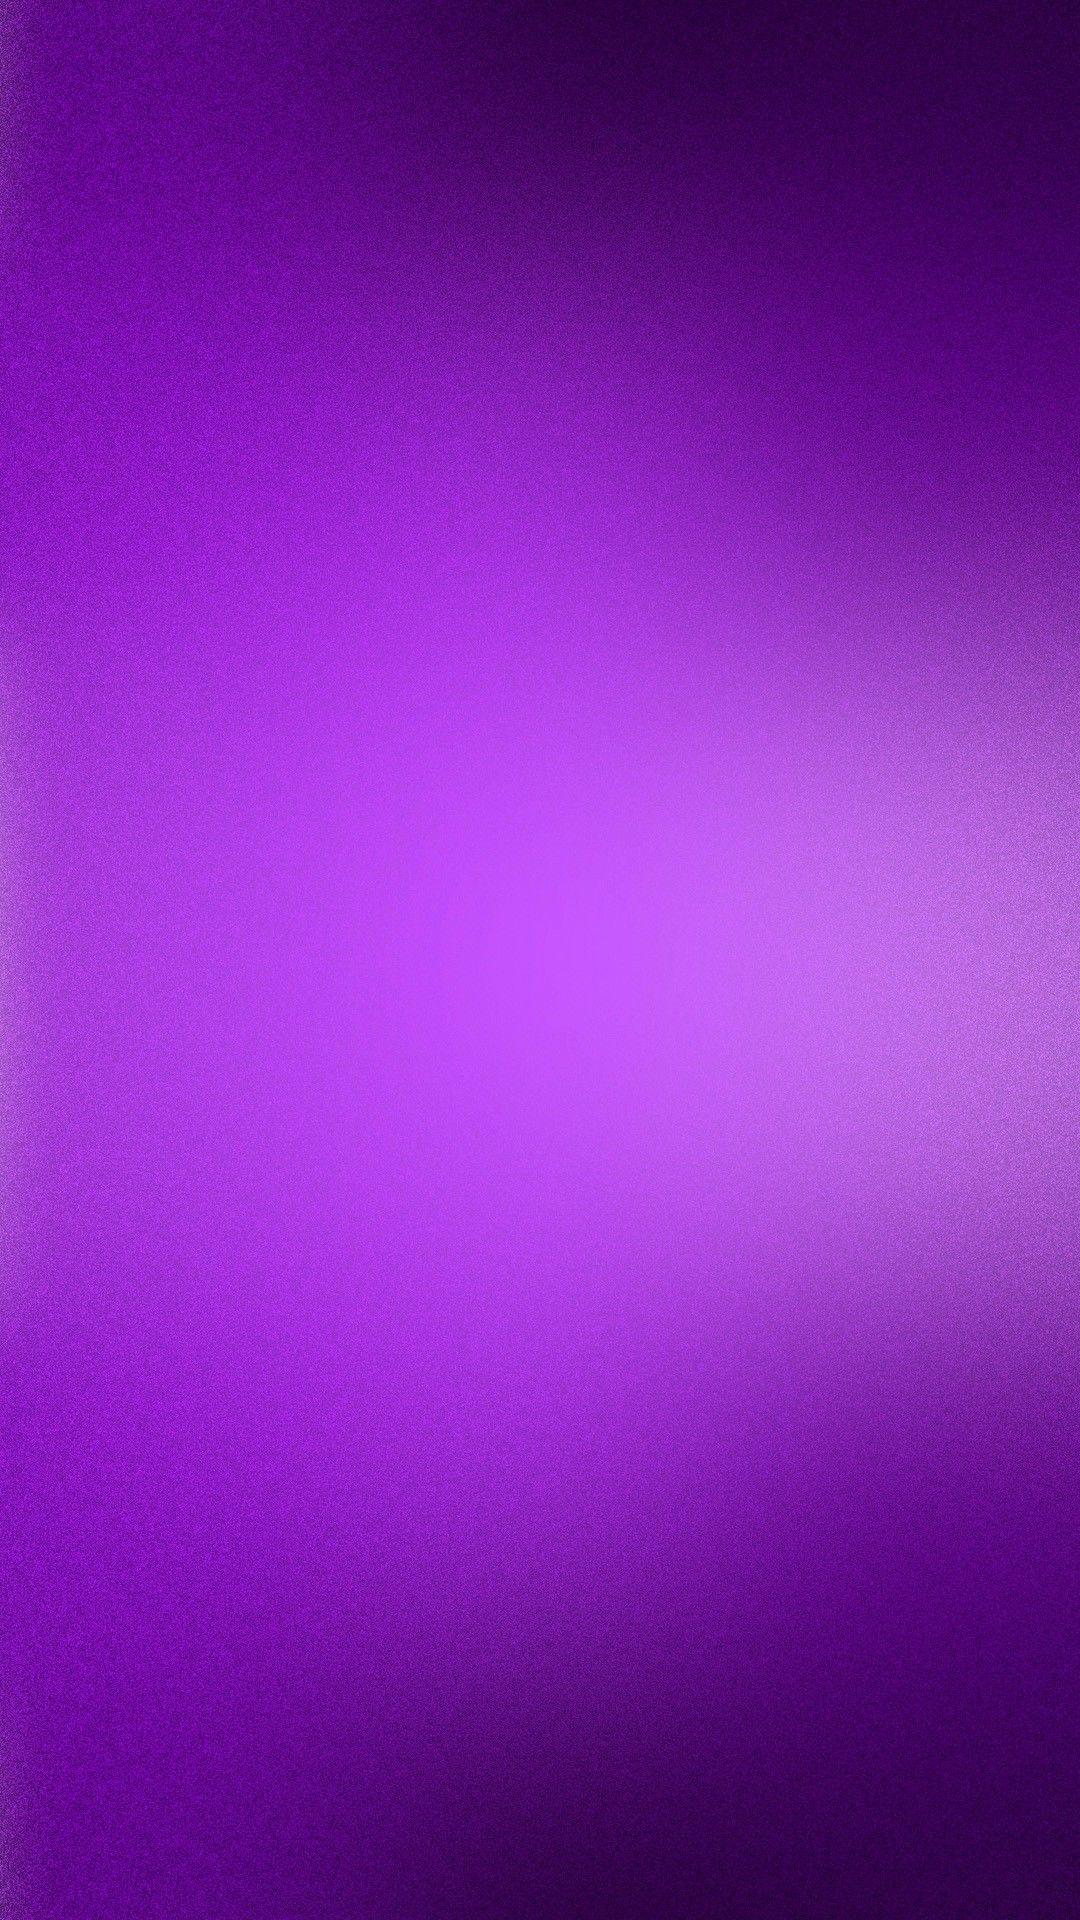 Hd Purple Iphone Wallpaper Best Iphone Wallpaper